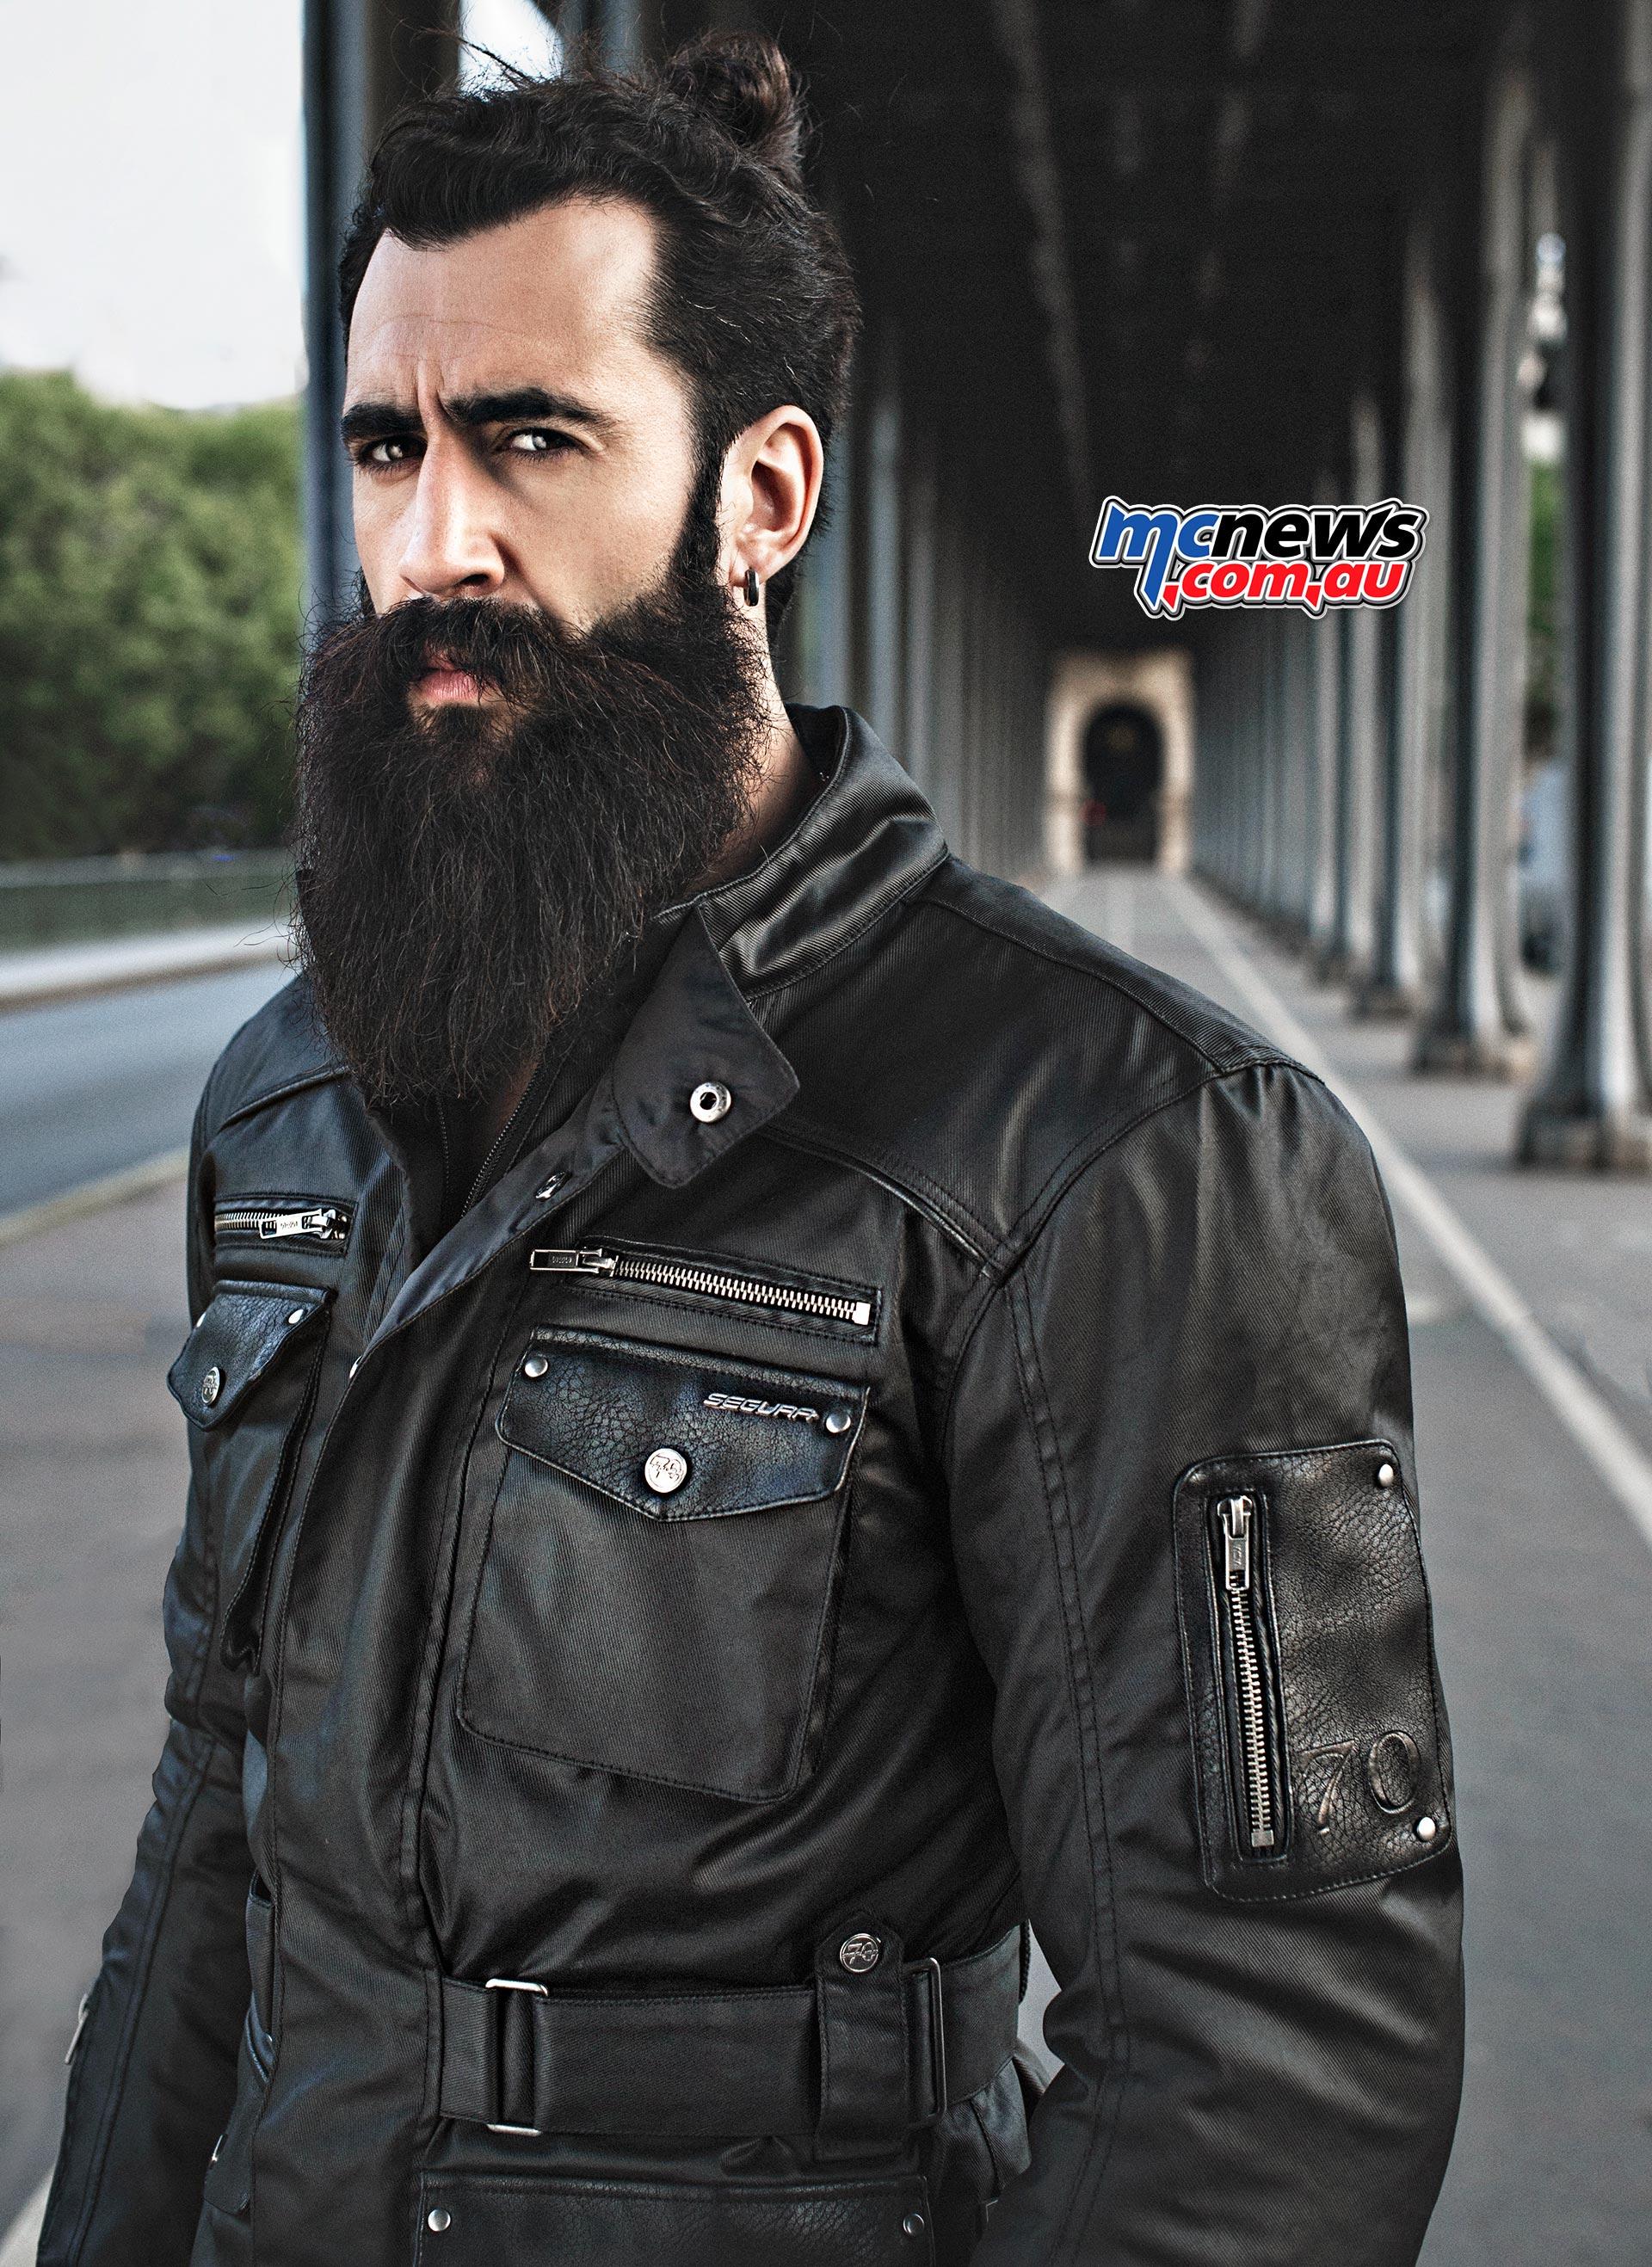 Segura Release New Nomad Motorcycle Jacket Mcnews Com Au